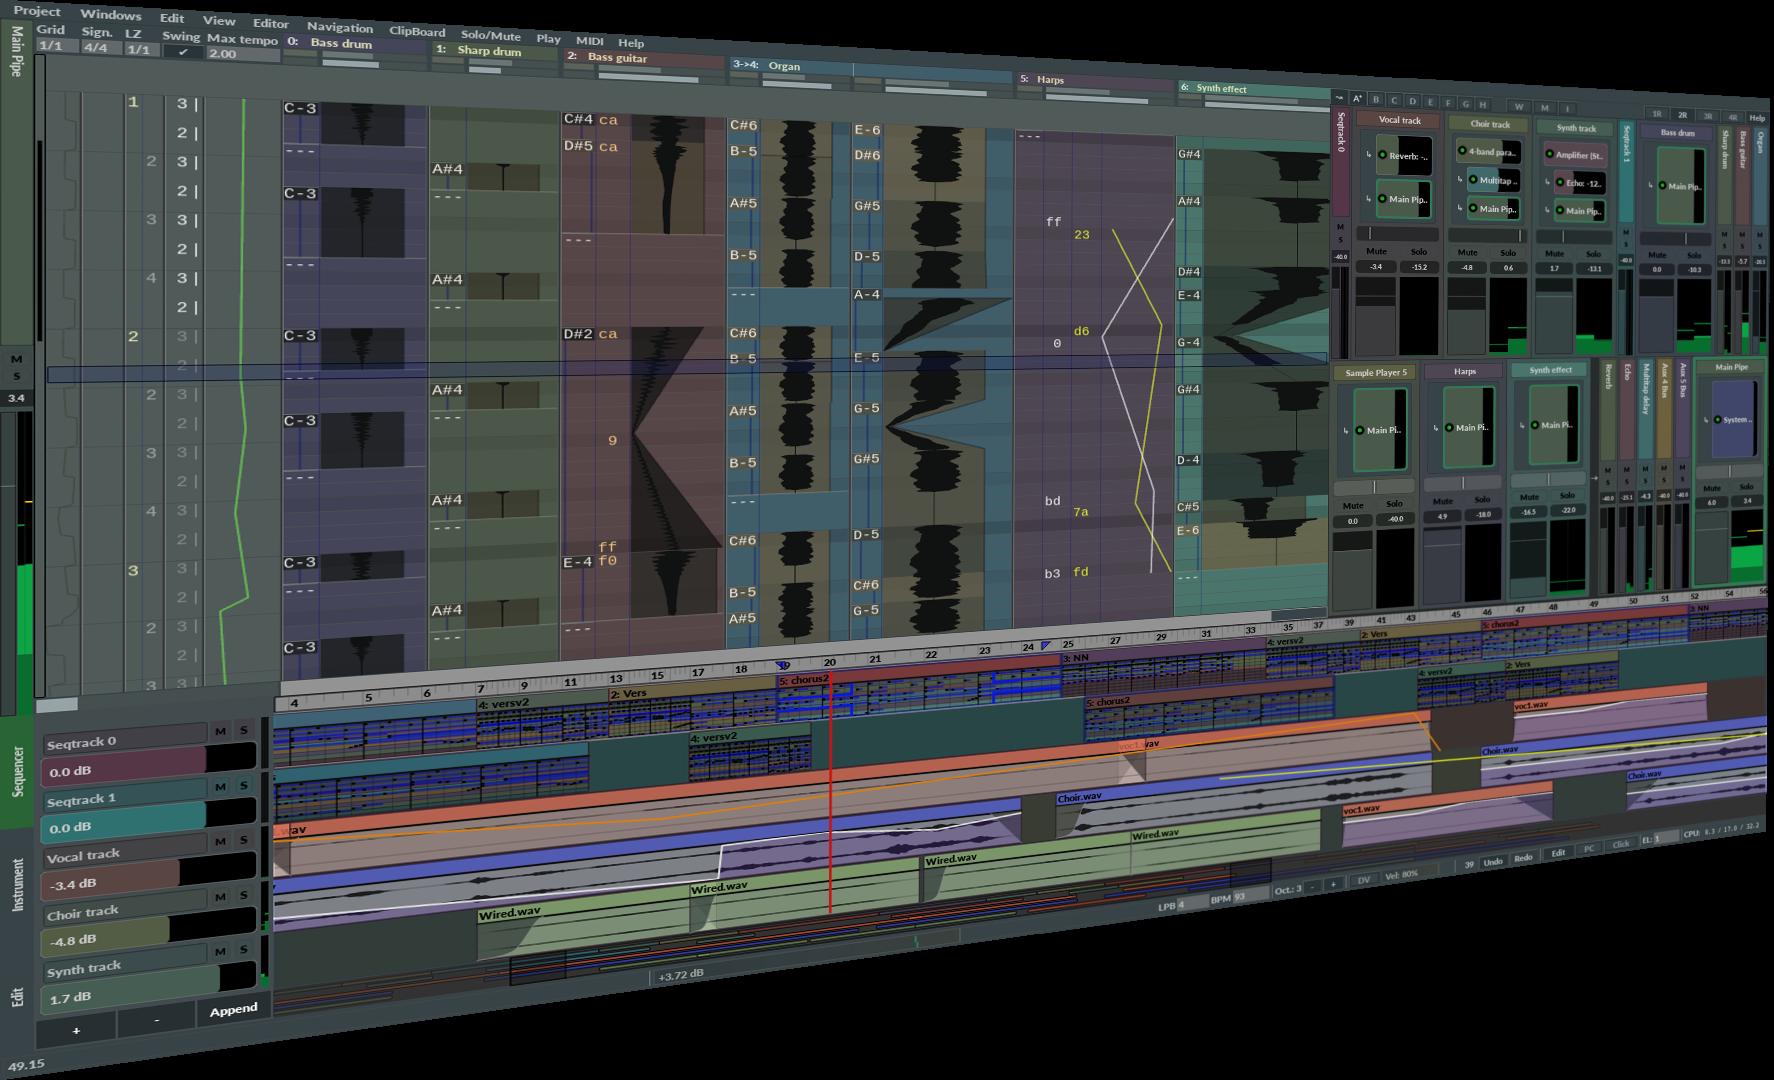 studio one 3 free download 64 bit